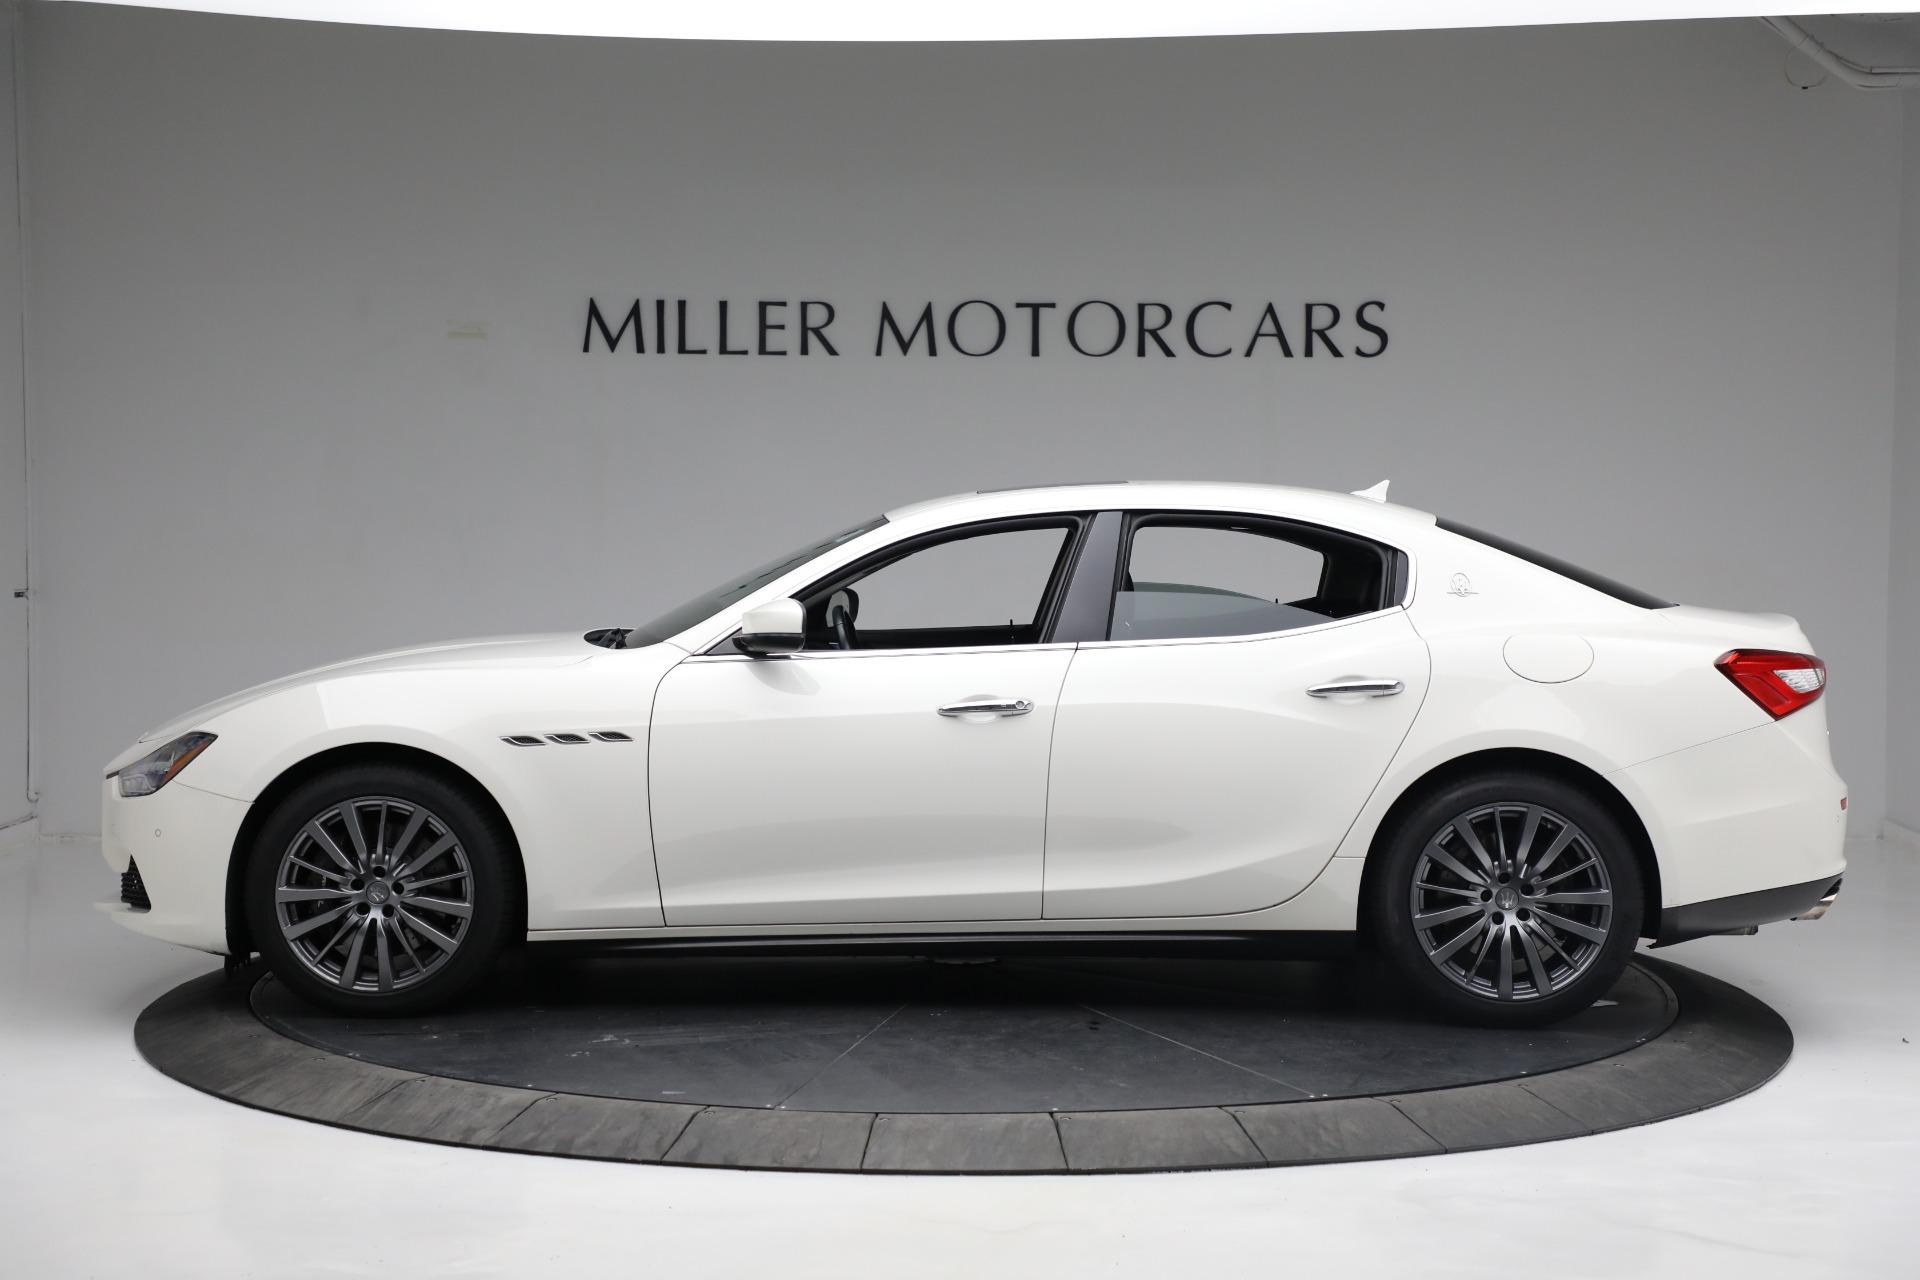 New 2017 Maserati Ghibli S Q4 EX-Loaner For Sale In Greenwich, CT 1019_p3